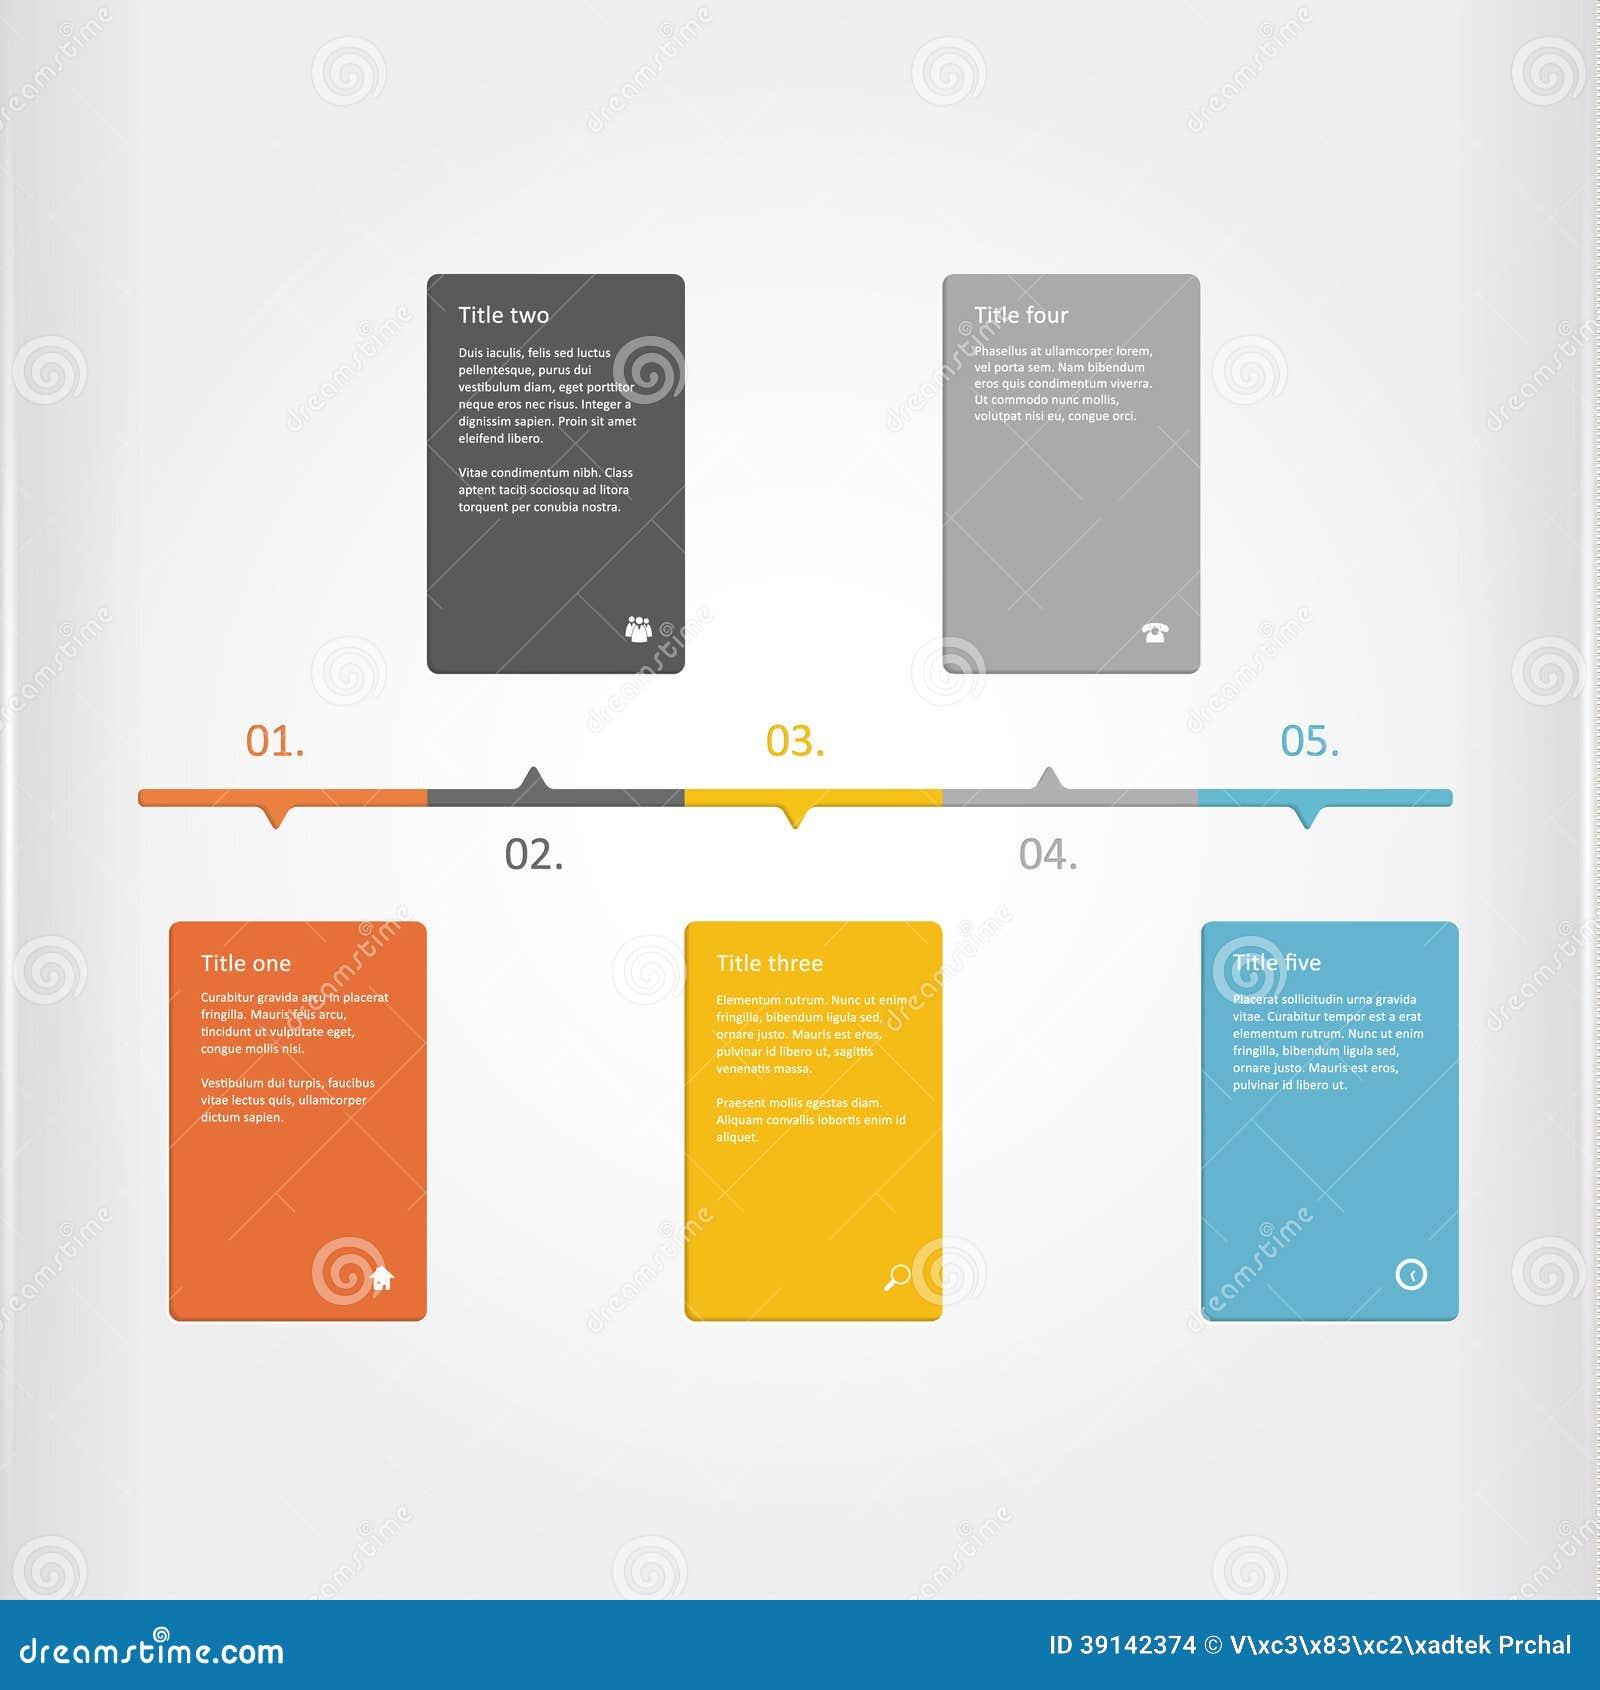 Vector Creative Timeline Template Matt Timeline Profile Colorf - Graphic timeline template